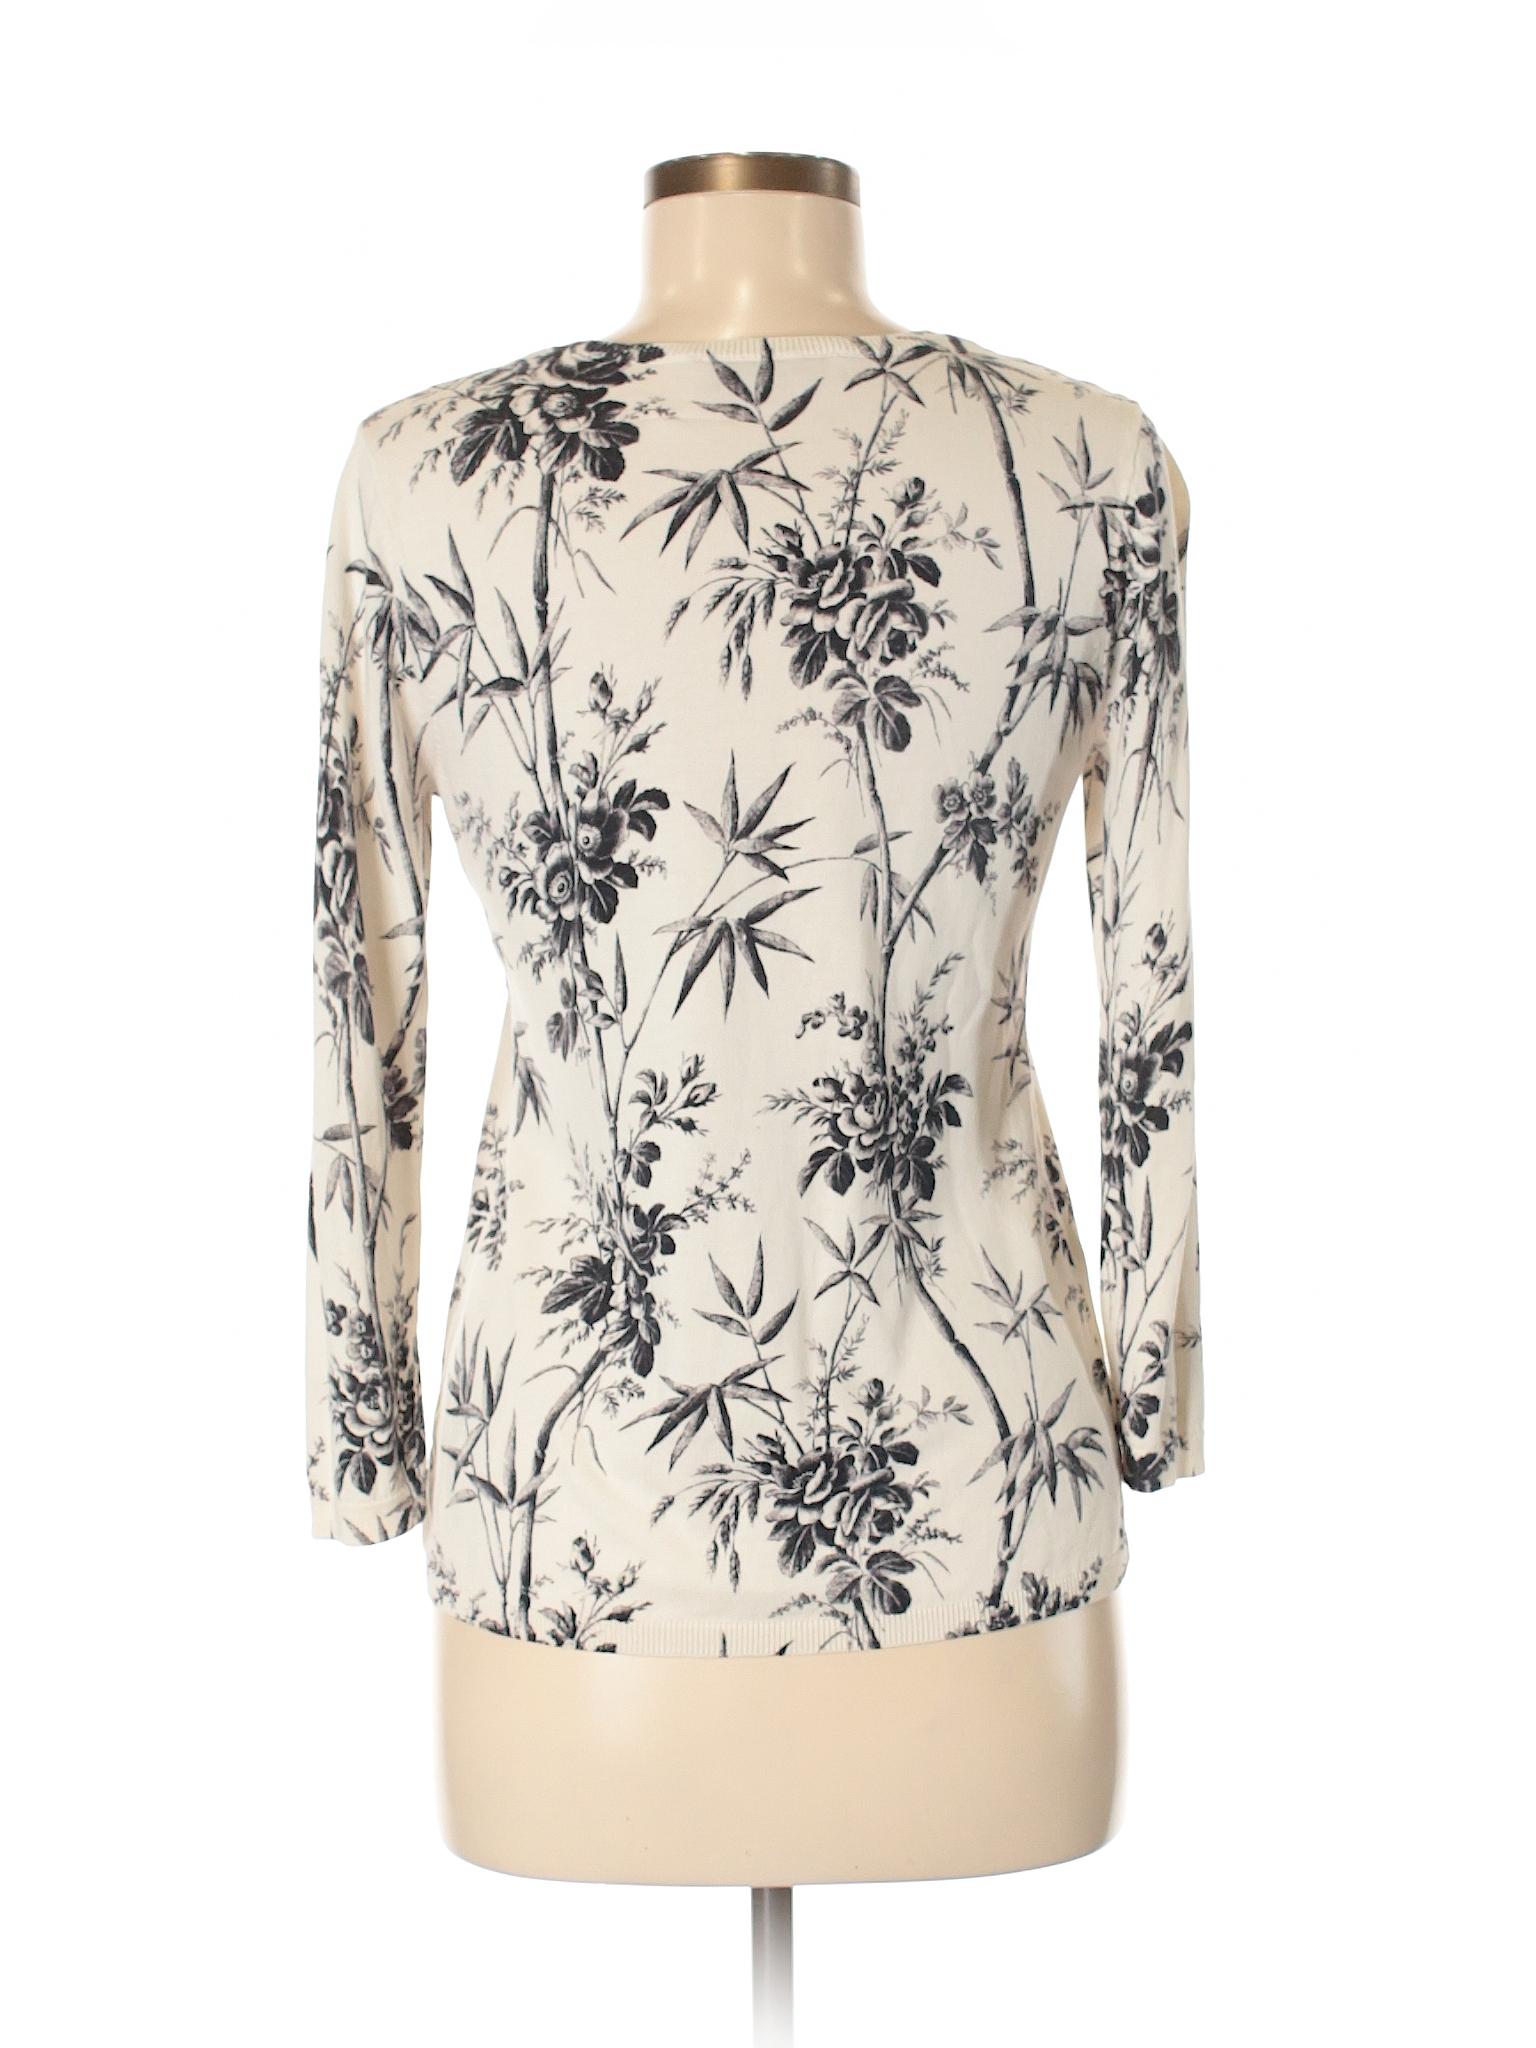 LOFT Boutique Sweater Pullover Taylor Ann 0q0Tw4XE